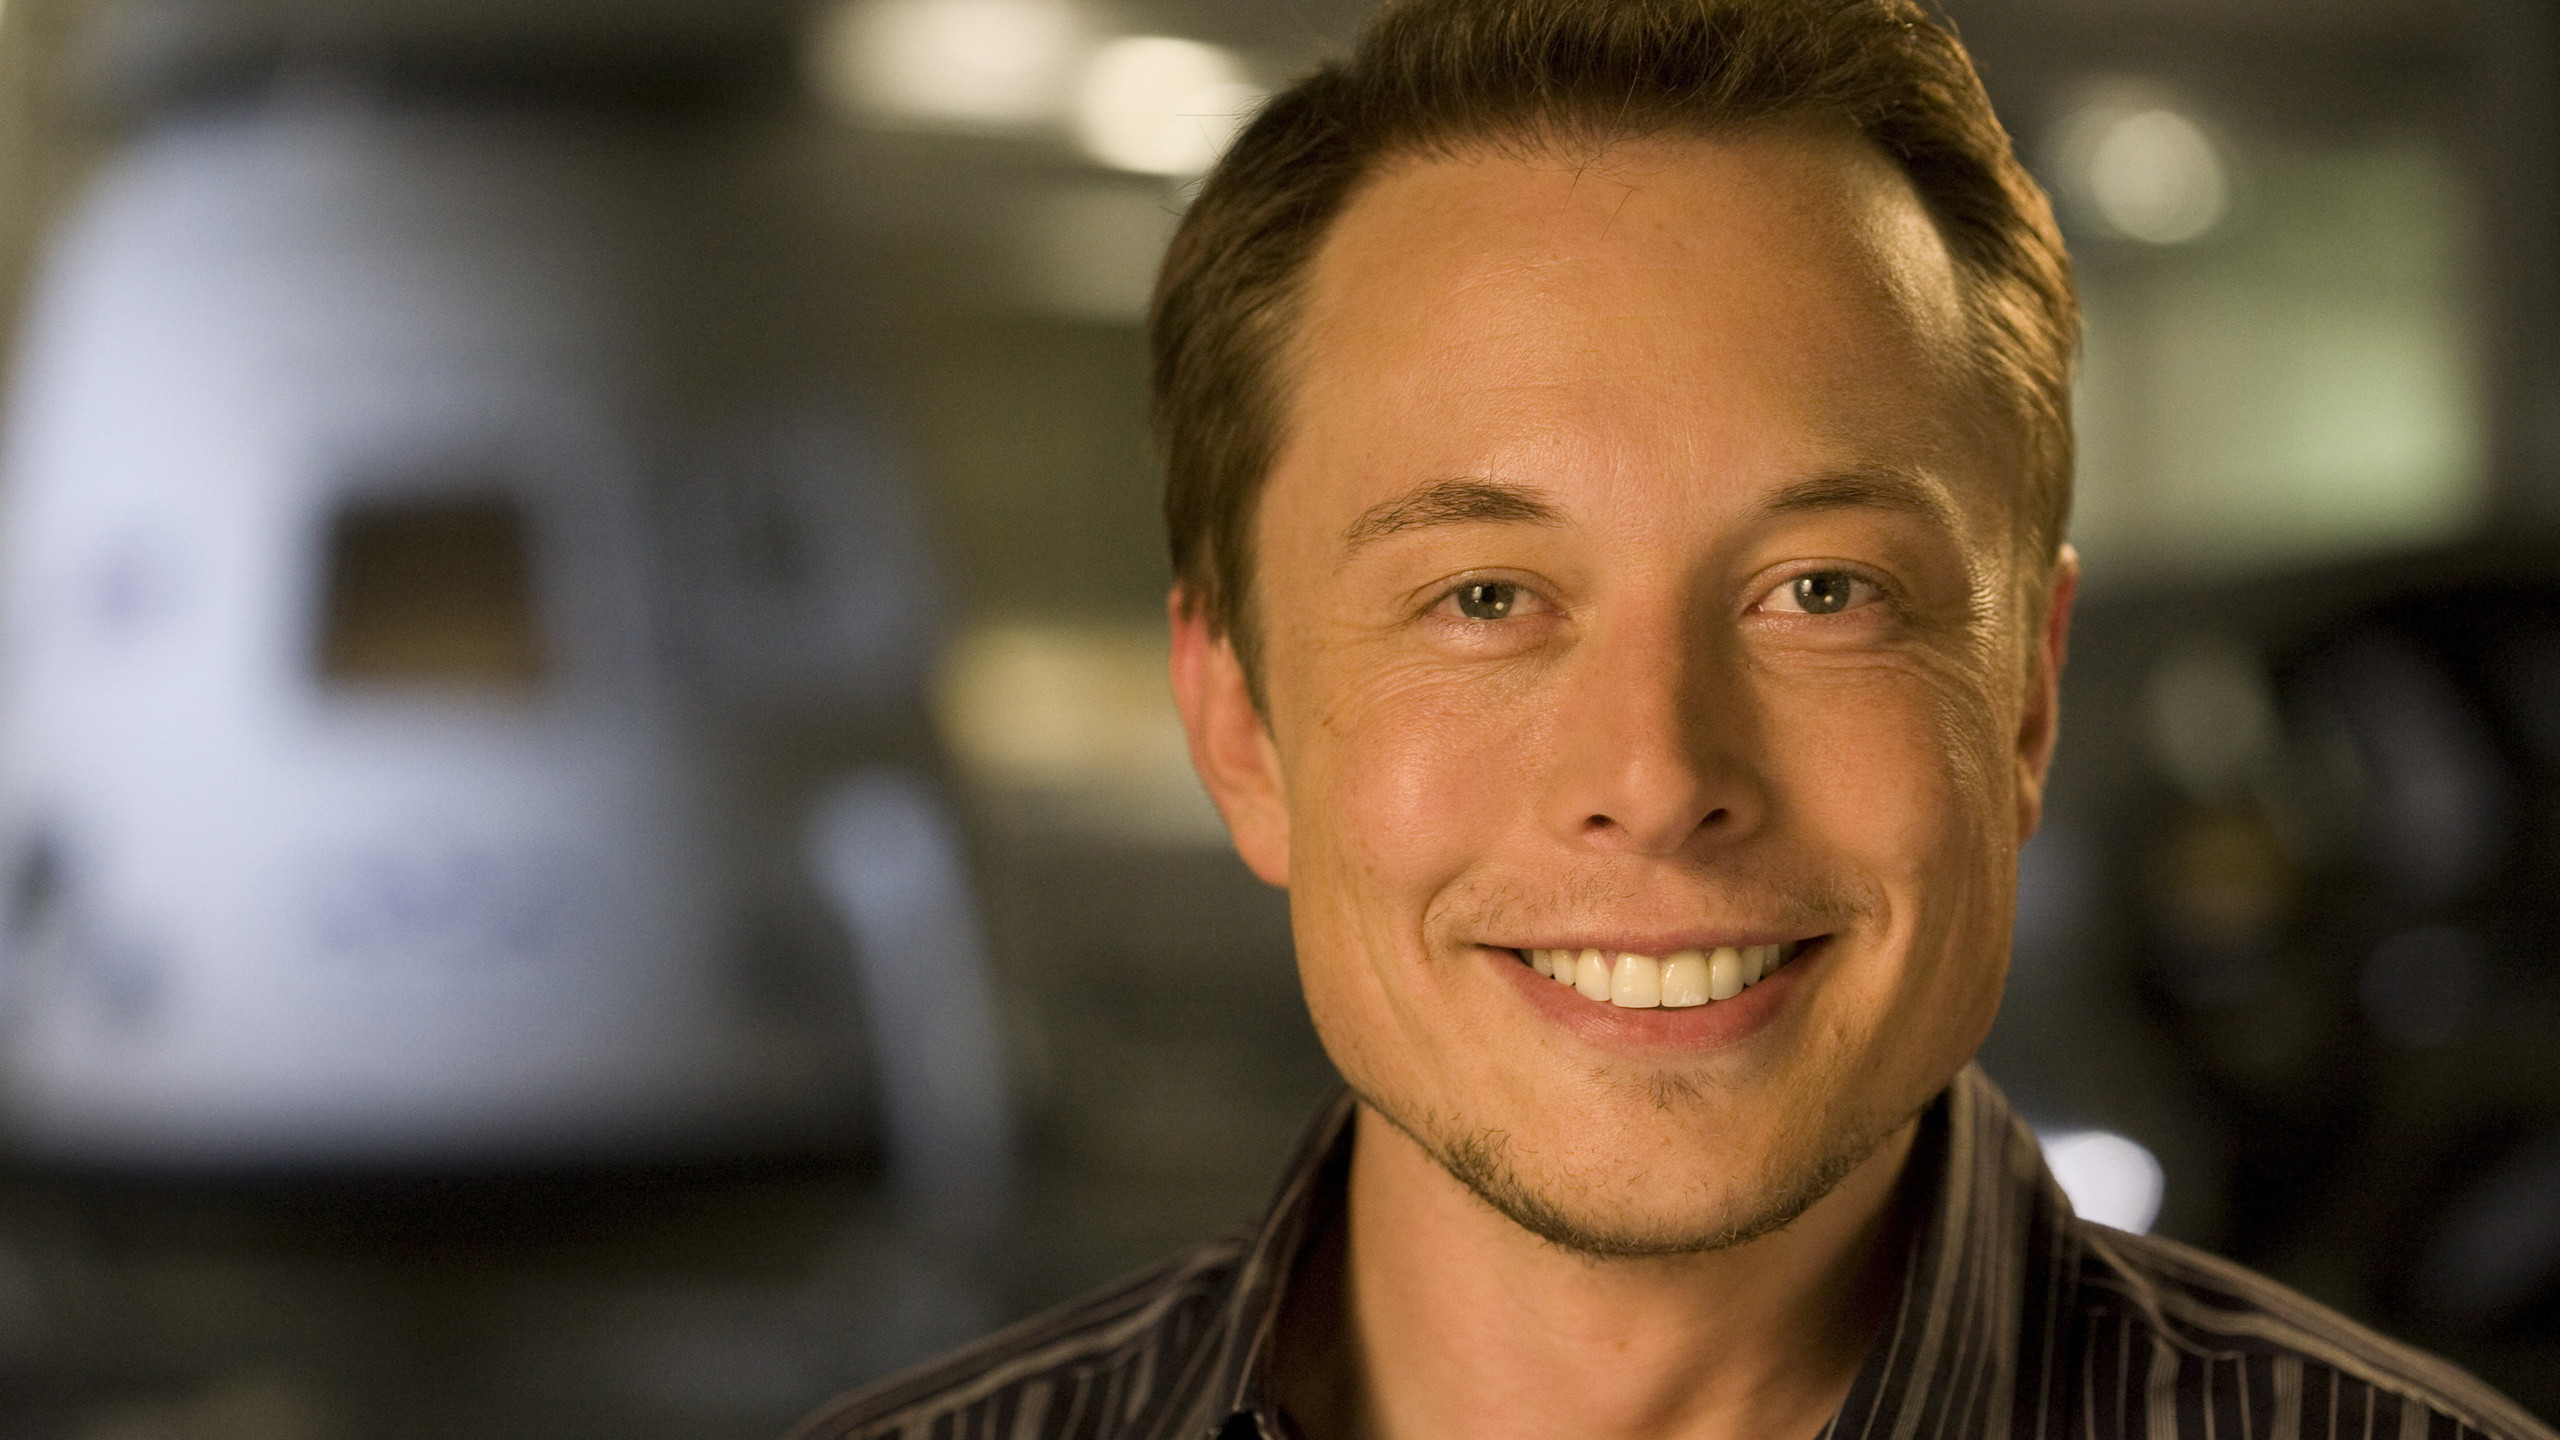 Elon Musk, Spacex, Ceo Of Spacex, Photos Of Elon Musk, Elon Musk